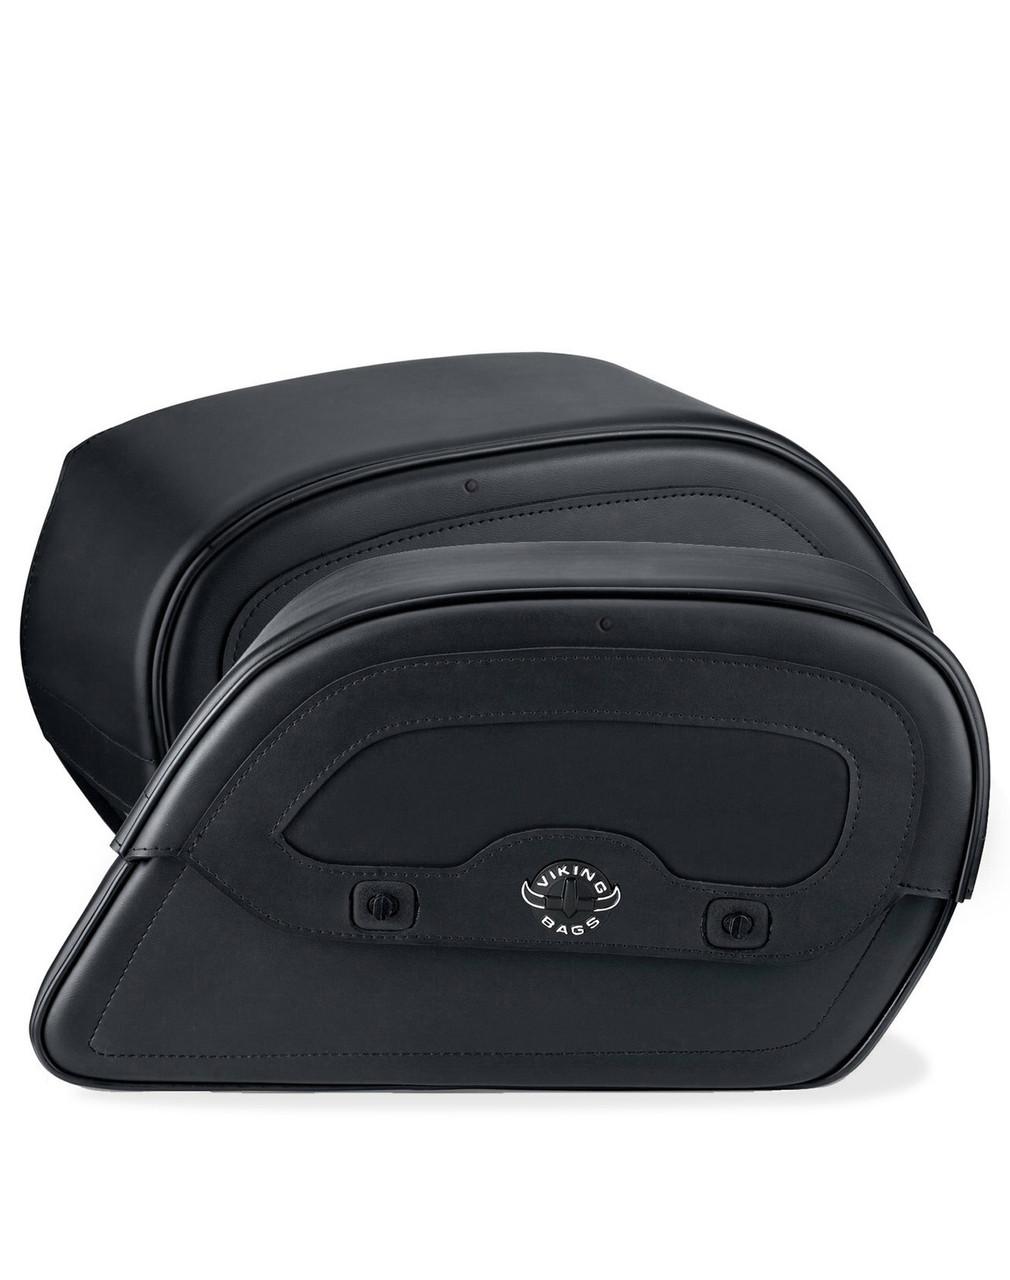 Honda 1500 Valkyrie Interstate Warrior Slanted Medium Motorcycle Saddlebags Both Bags View